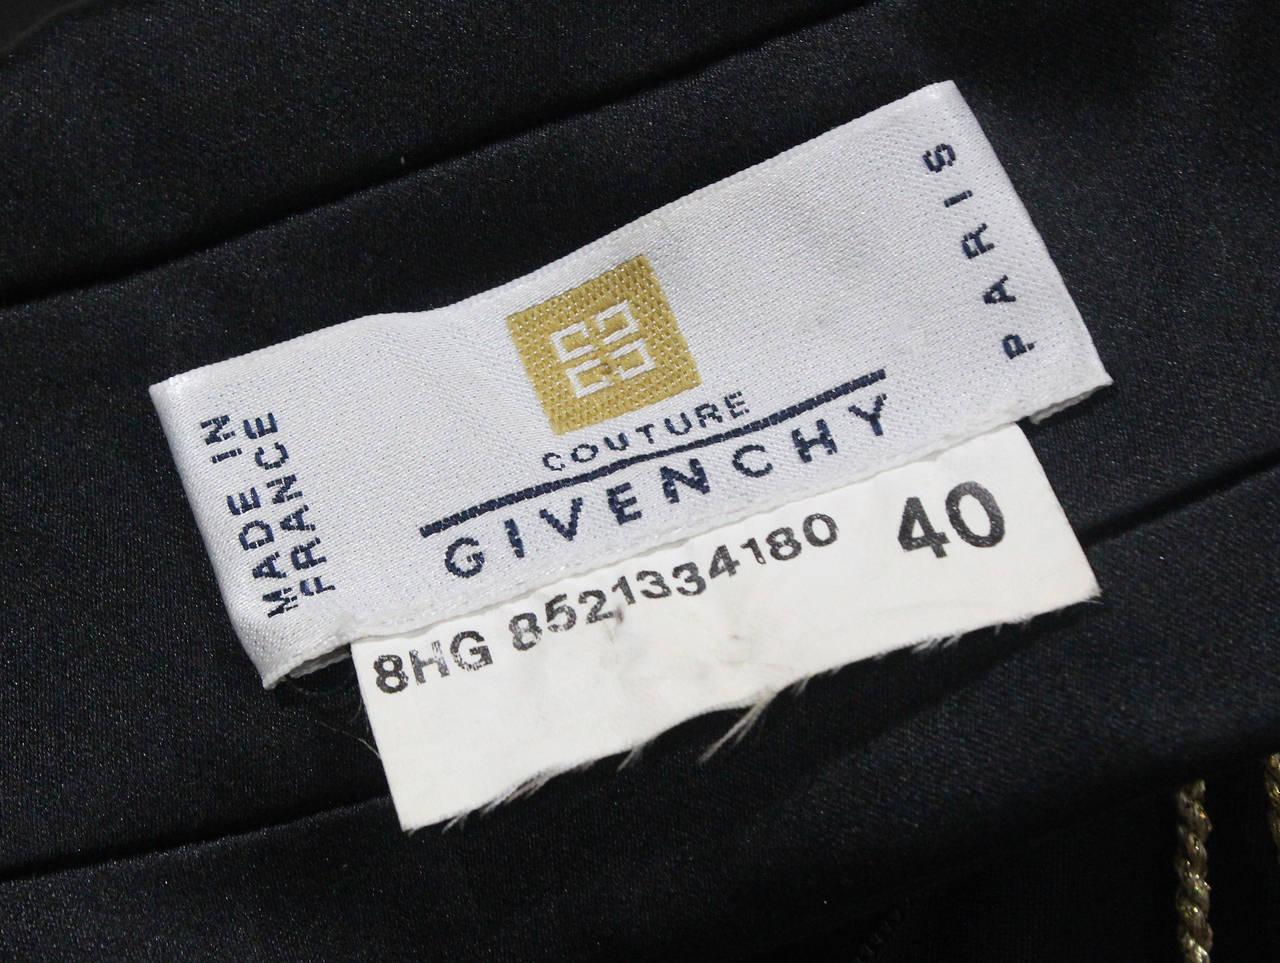 1990s Givenchy by Alexander McQueen Black Silk Evening Dress (Unworn) 6